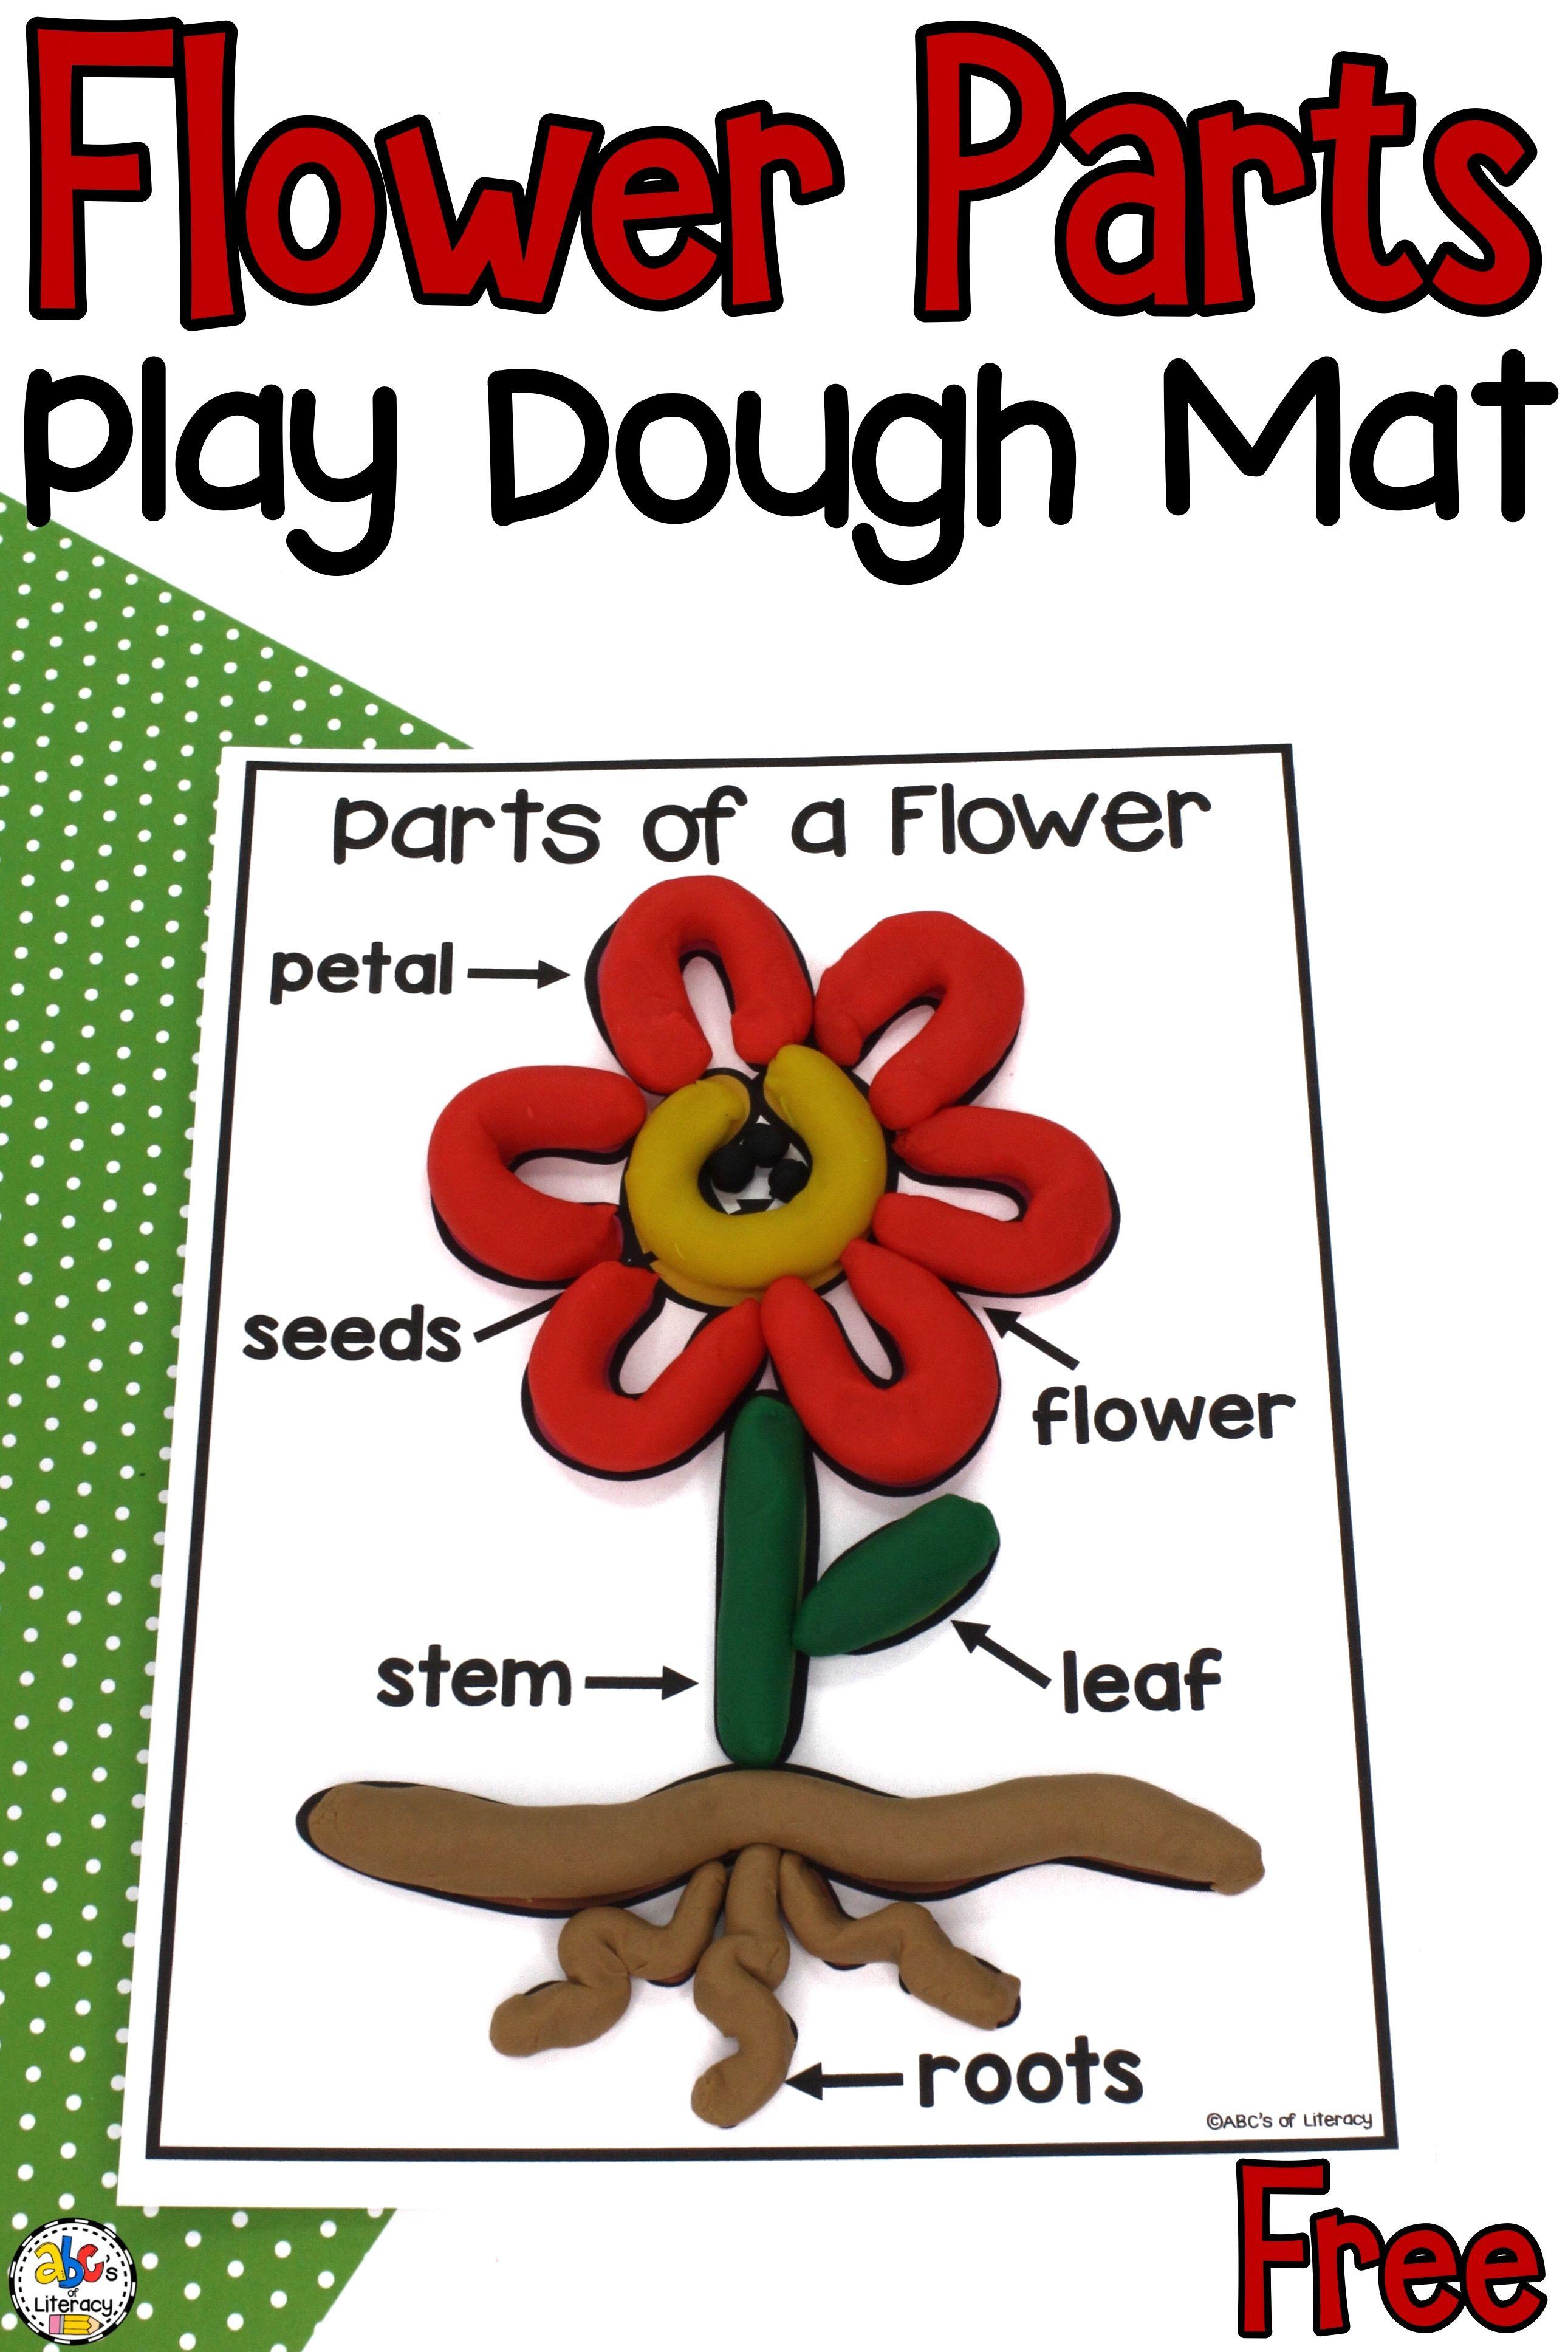 Flower Parts Play Dough Mat Sensory Activity For Kids Parts Of A Flower Flower Activities For Kids Plant Activities [ 3871 x 2581 Pixel ]